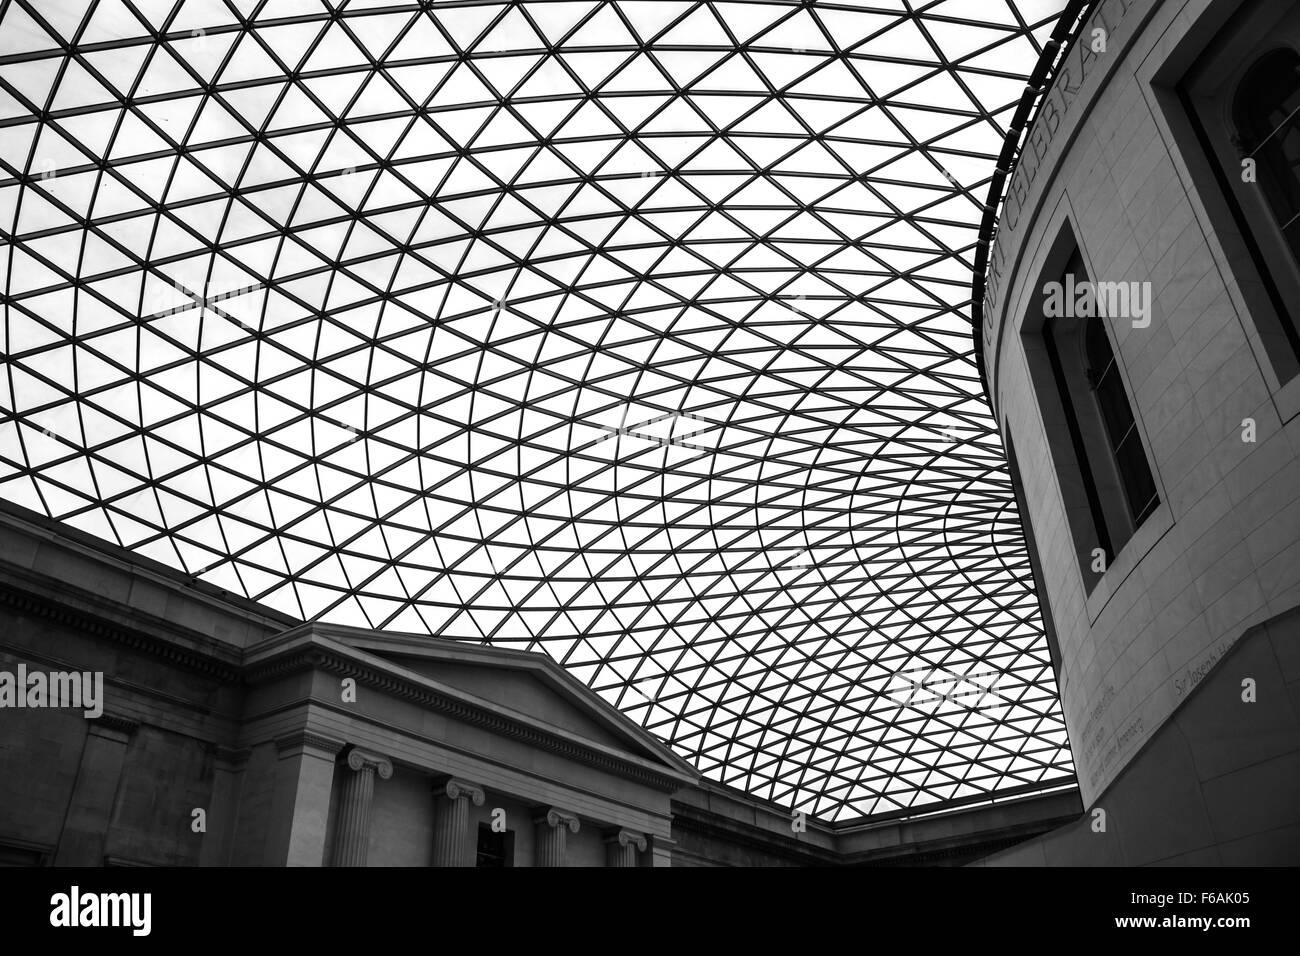 British Museum - Stock Image